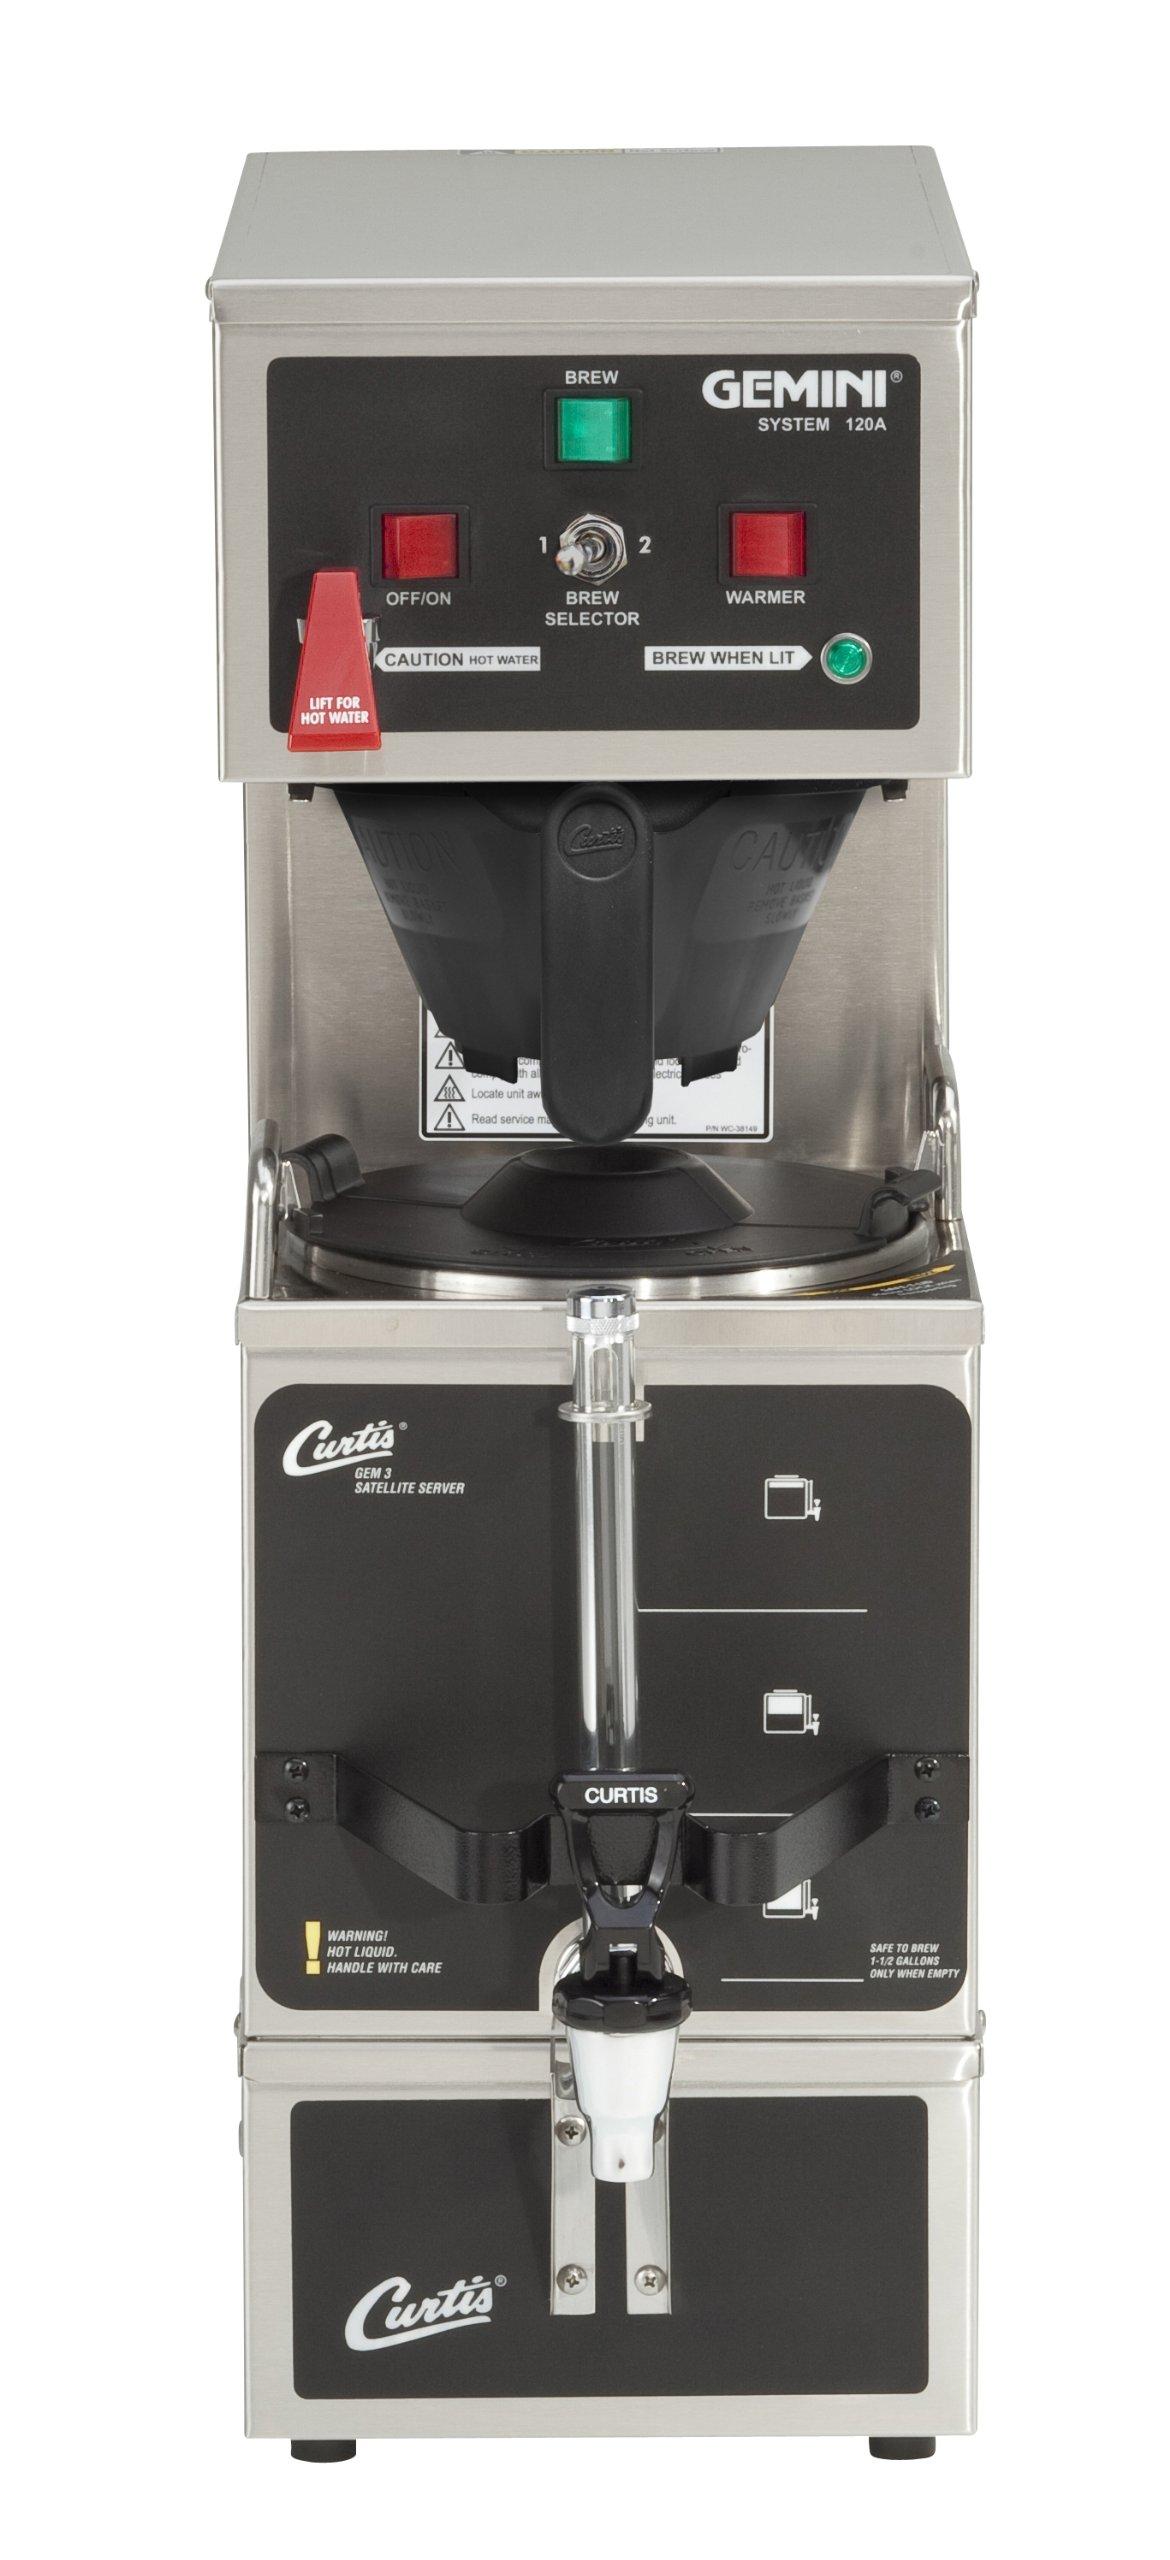 Wilbur Curtis Gemini Single Coffee Brewer, Analog, 1.0 Gal. - Commercial Coffee Brewer  - GEM-120A-10 (Each)